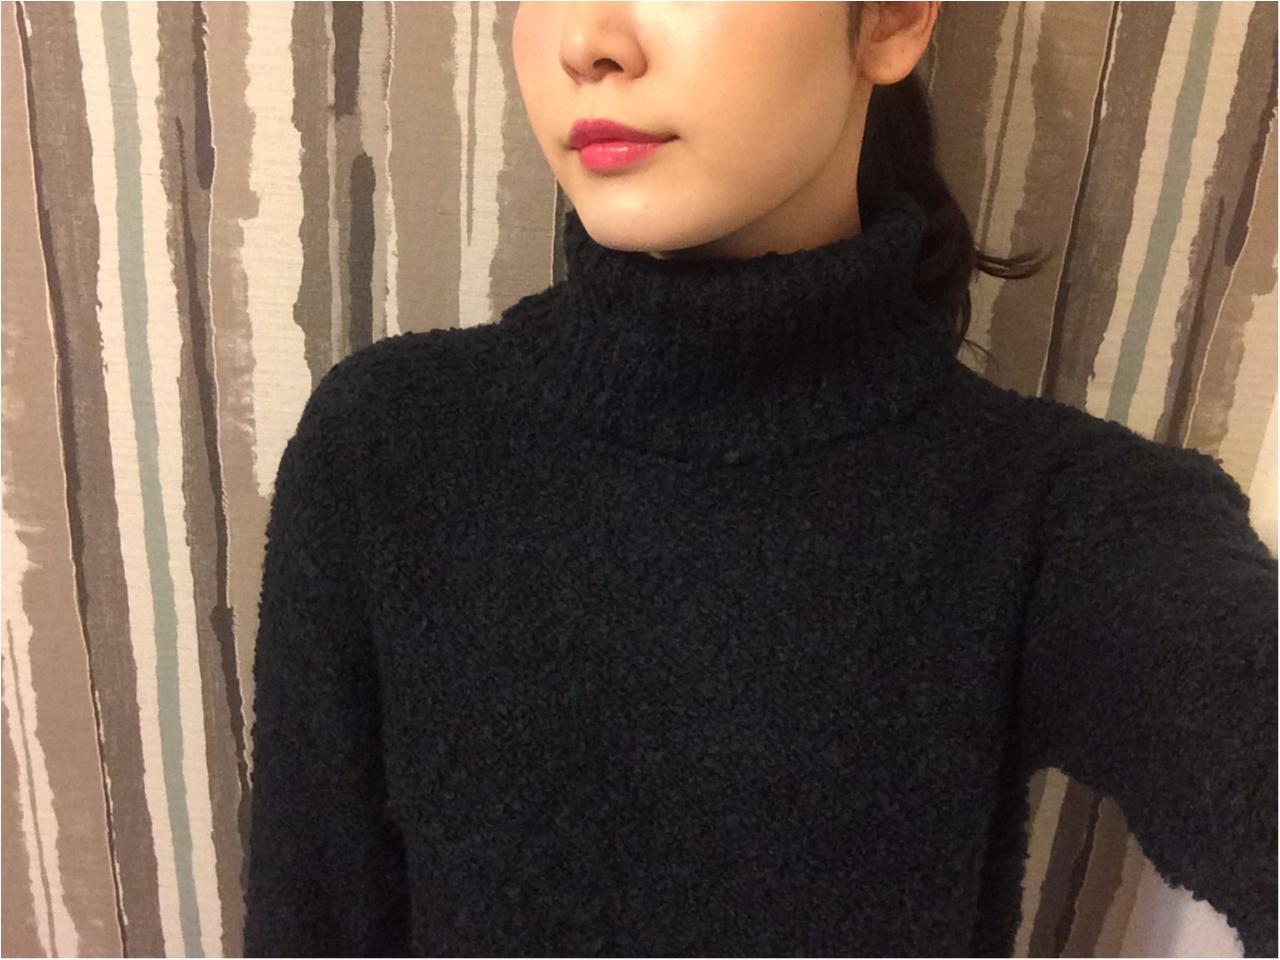 【GU】フワモコセーターで寒い冬に備えよう♡_4